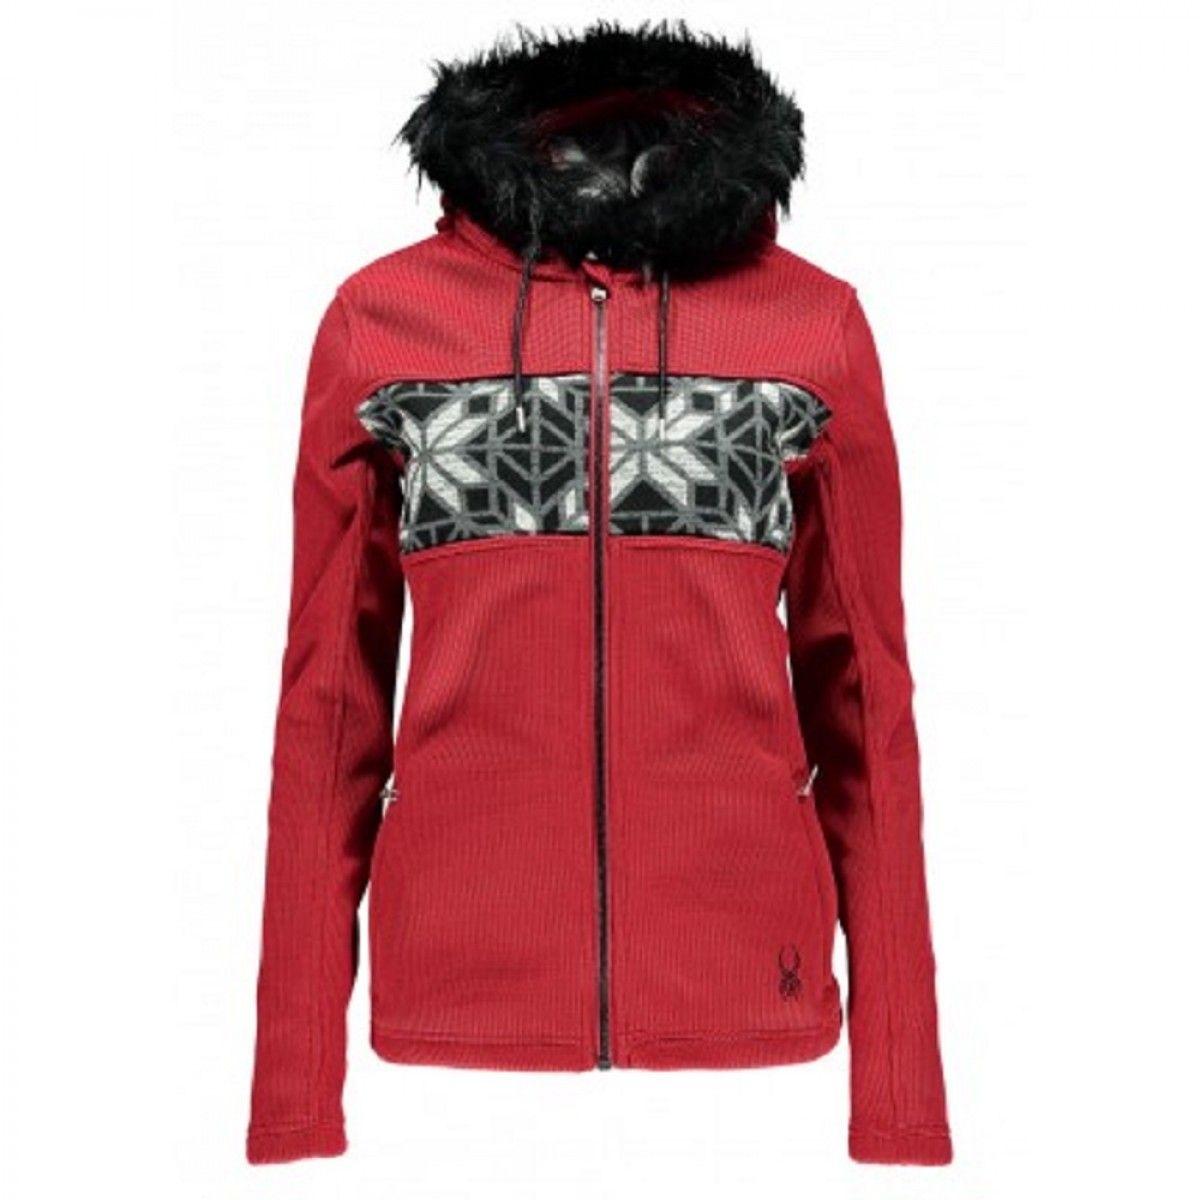 1a684d509 Spyder Womens Soiree Hoody Faux Fur Core Sweater from Golf   Ski ...